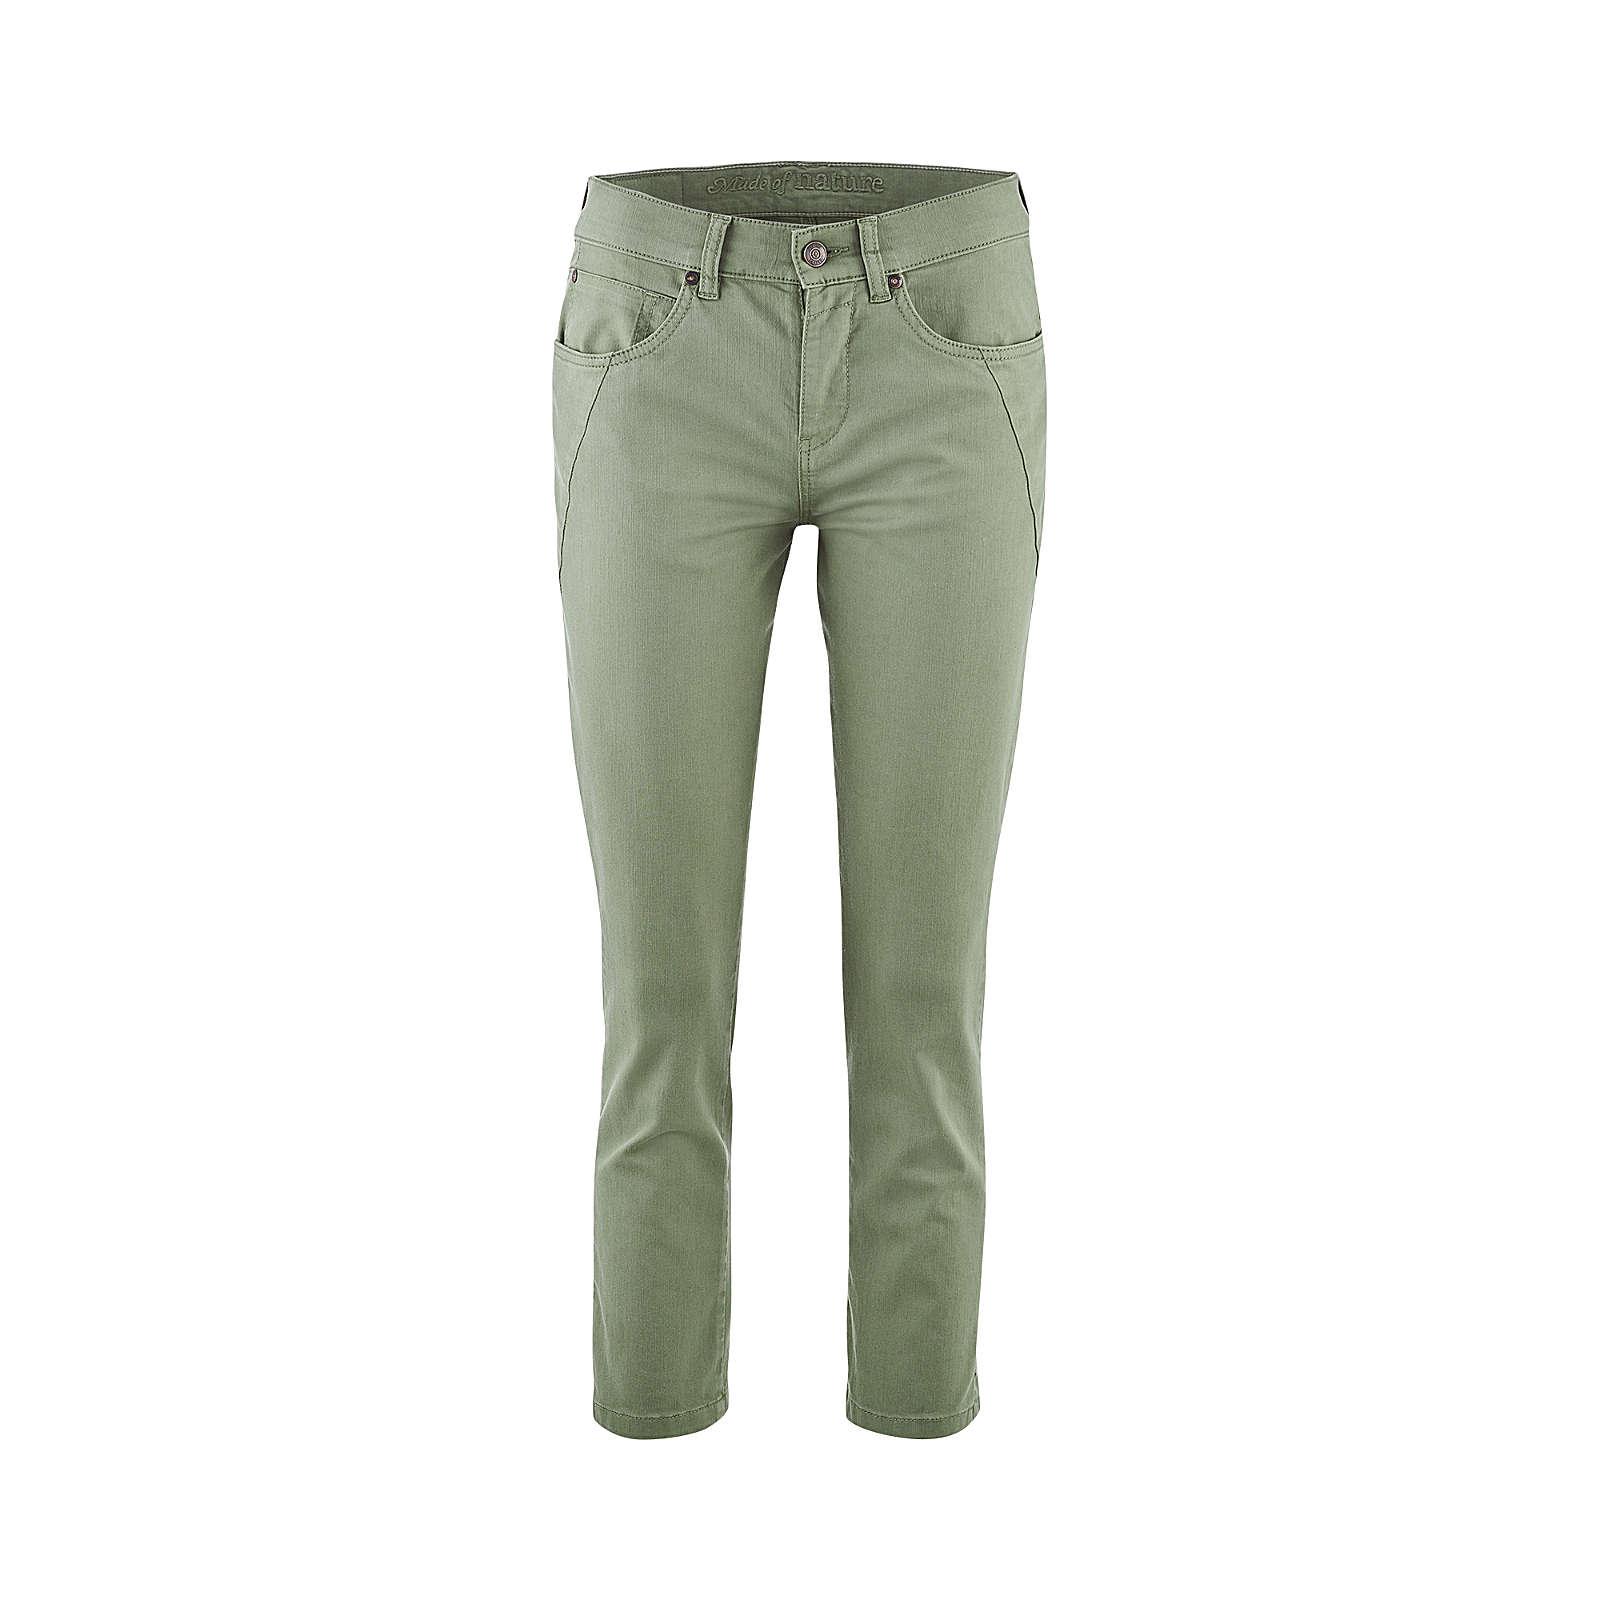 LIVING CRAFTS 5-Pocket-Hose Stoffhosen khaki Damen Gr. 33